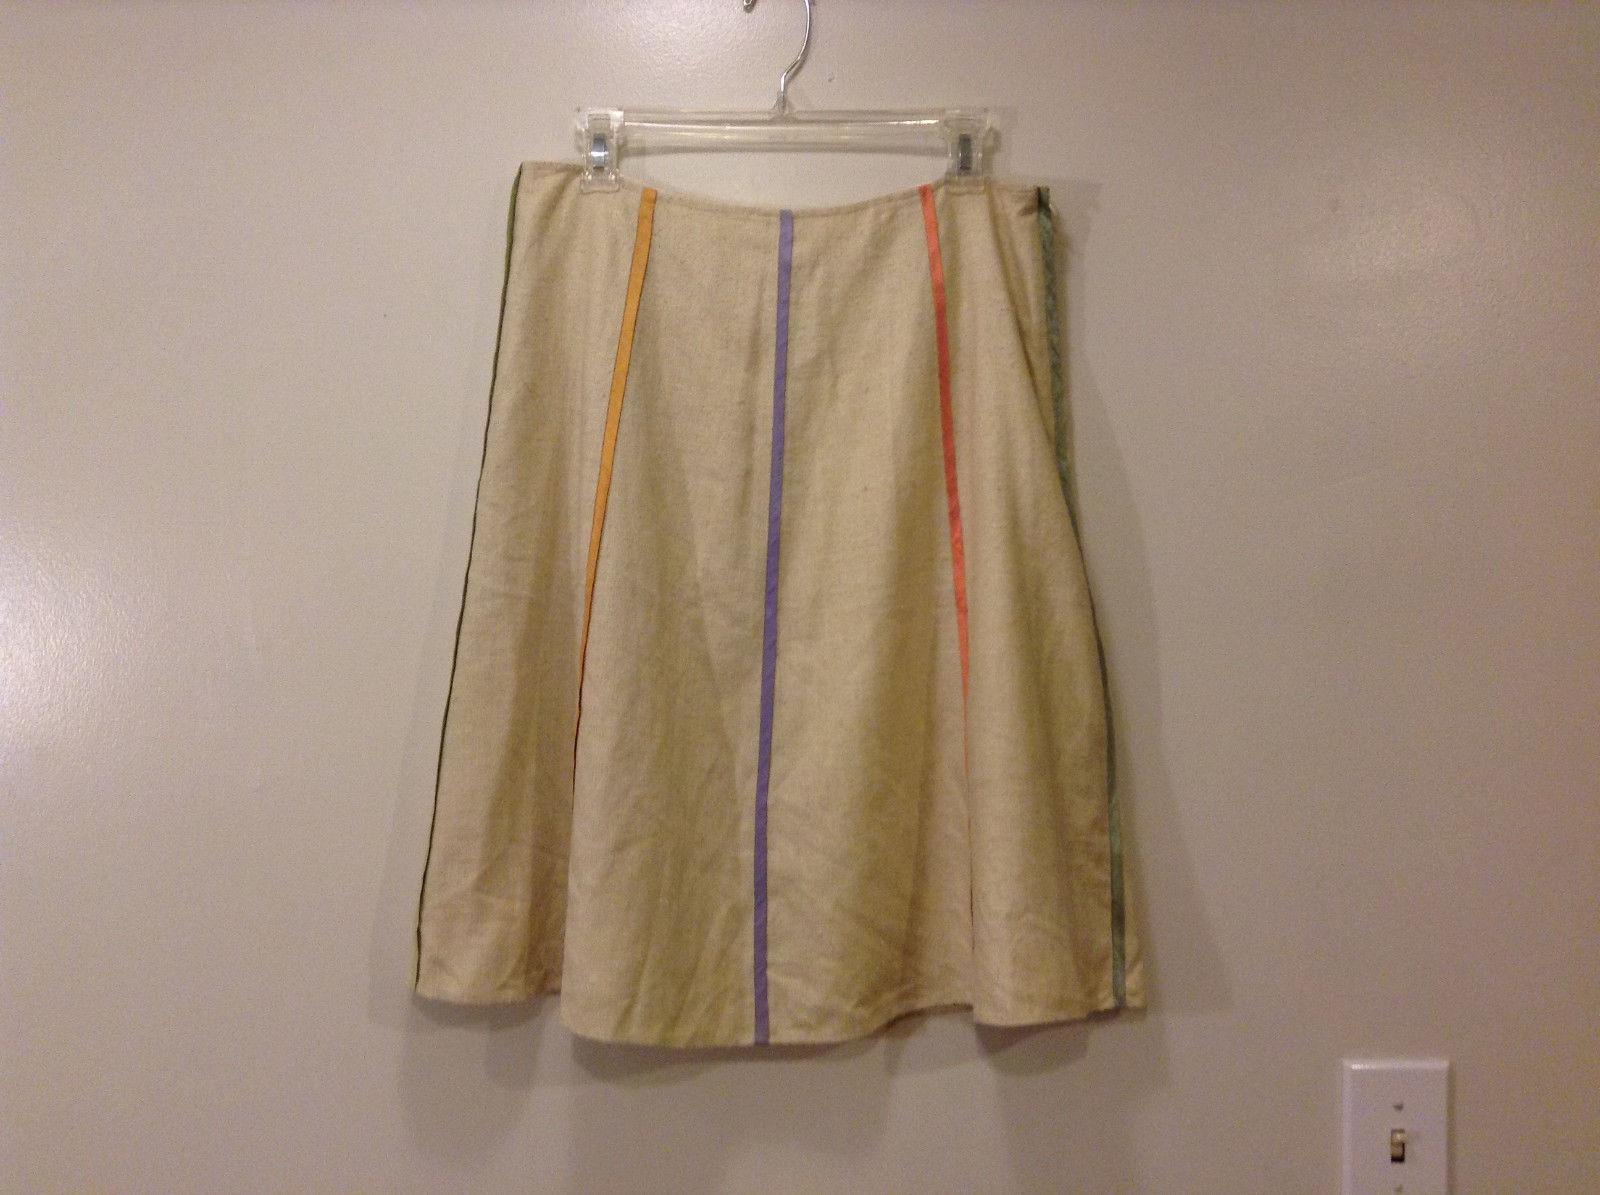 Annie Walwyn-Jones Custom Made Cream with Stripes A-line Skirt Size L 100% Silk